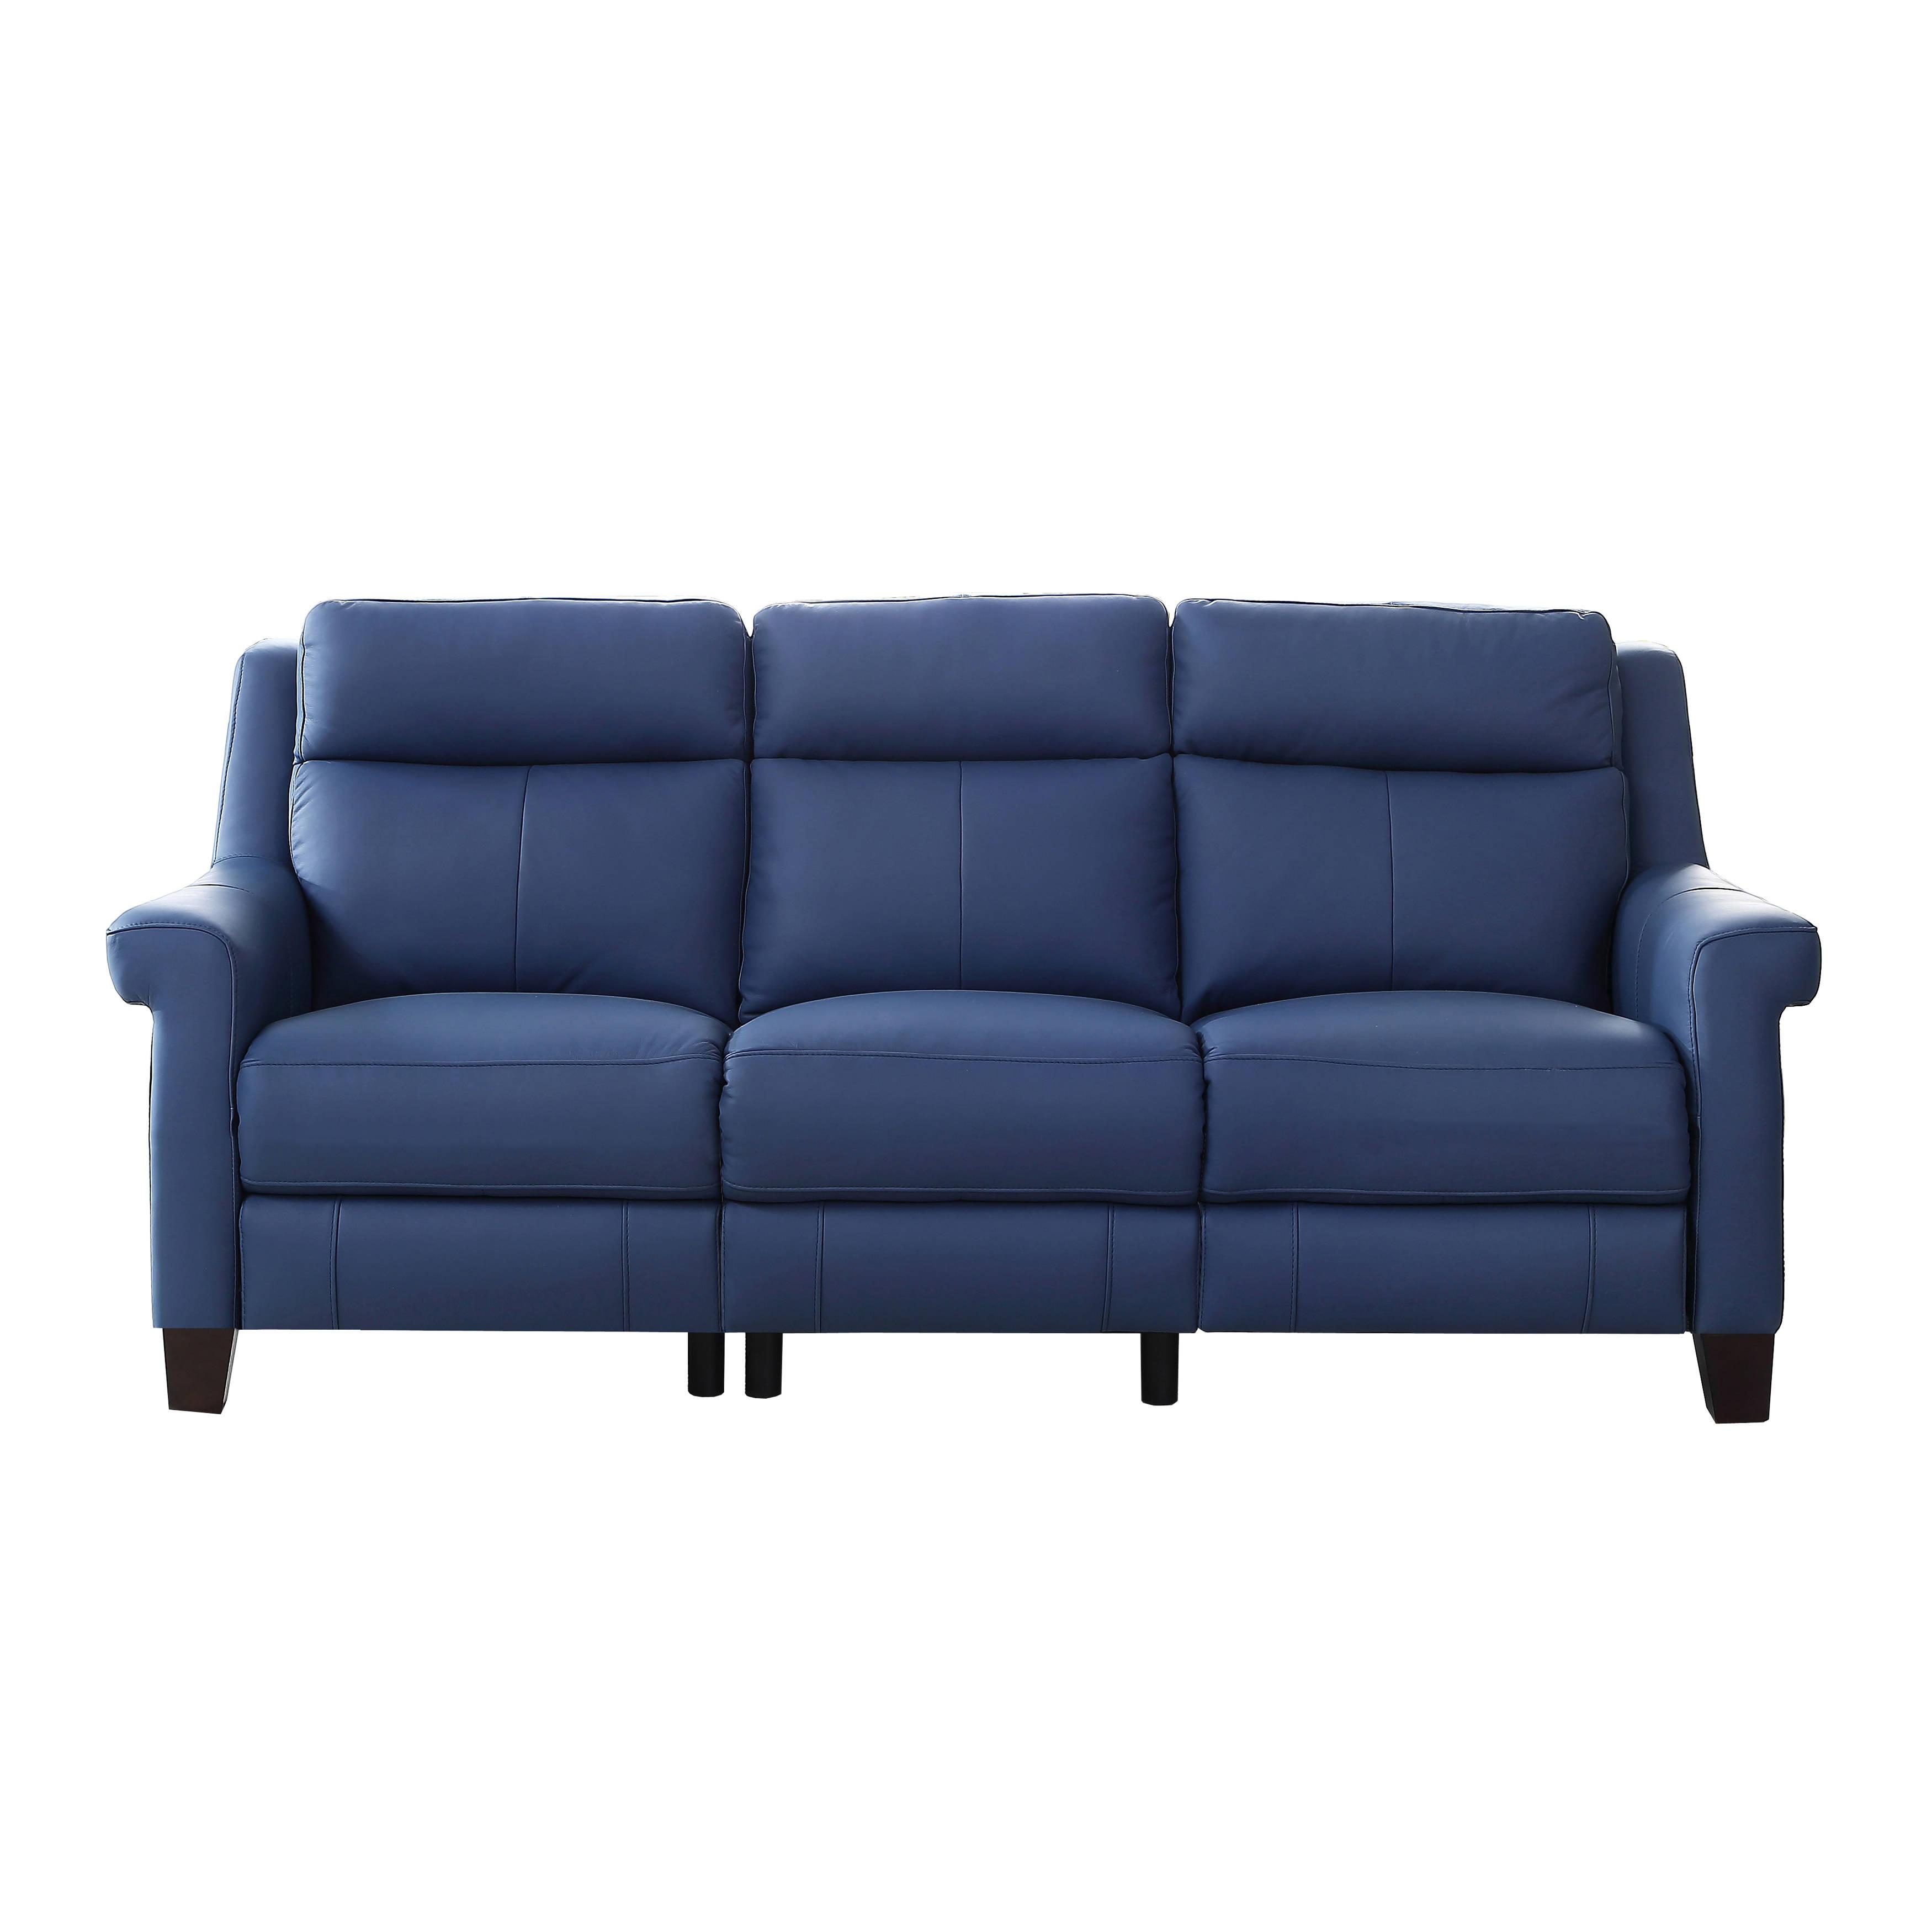 blue reclining sofa amax leather dolce blue power reclining sofa | the classy home NTEGPFU